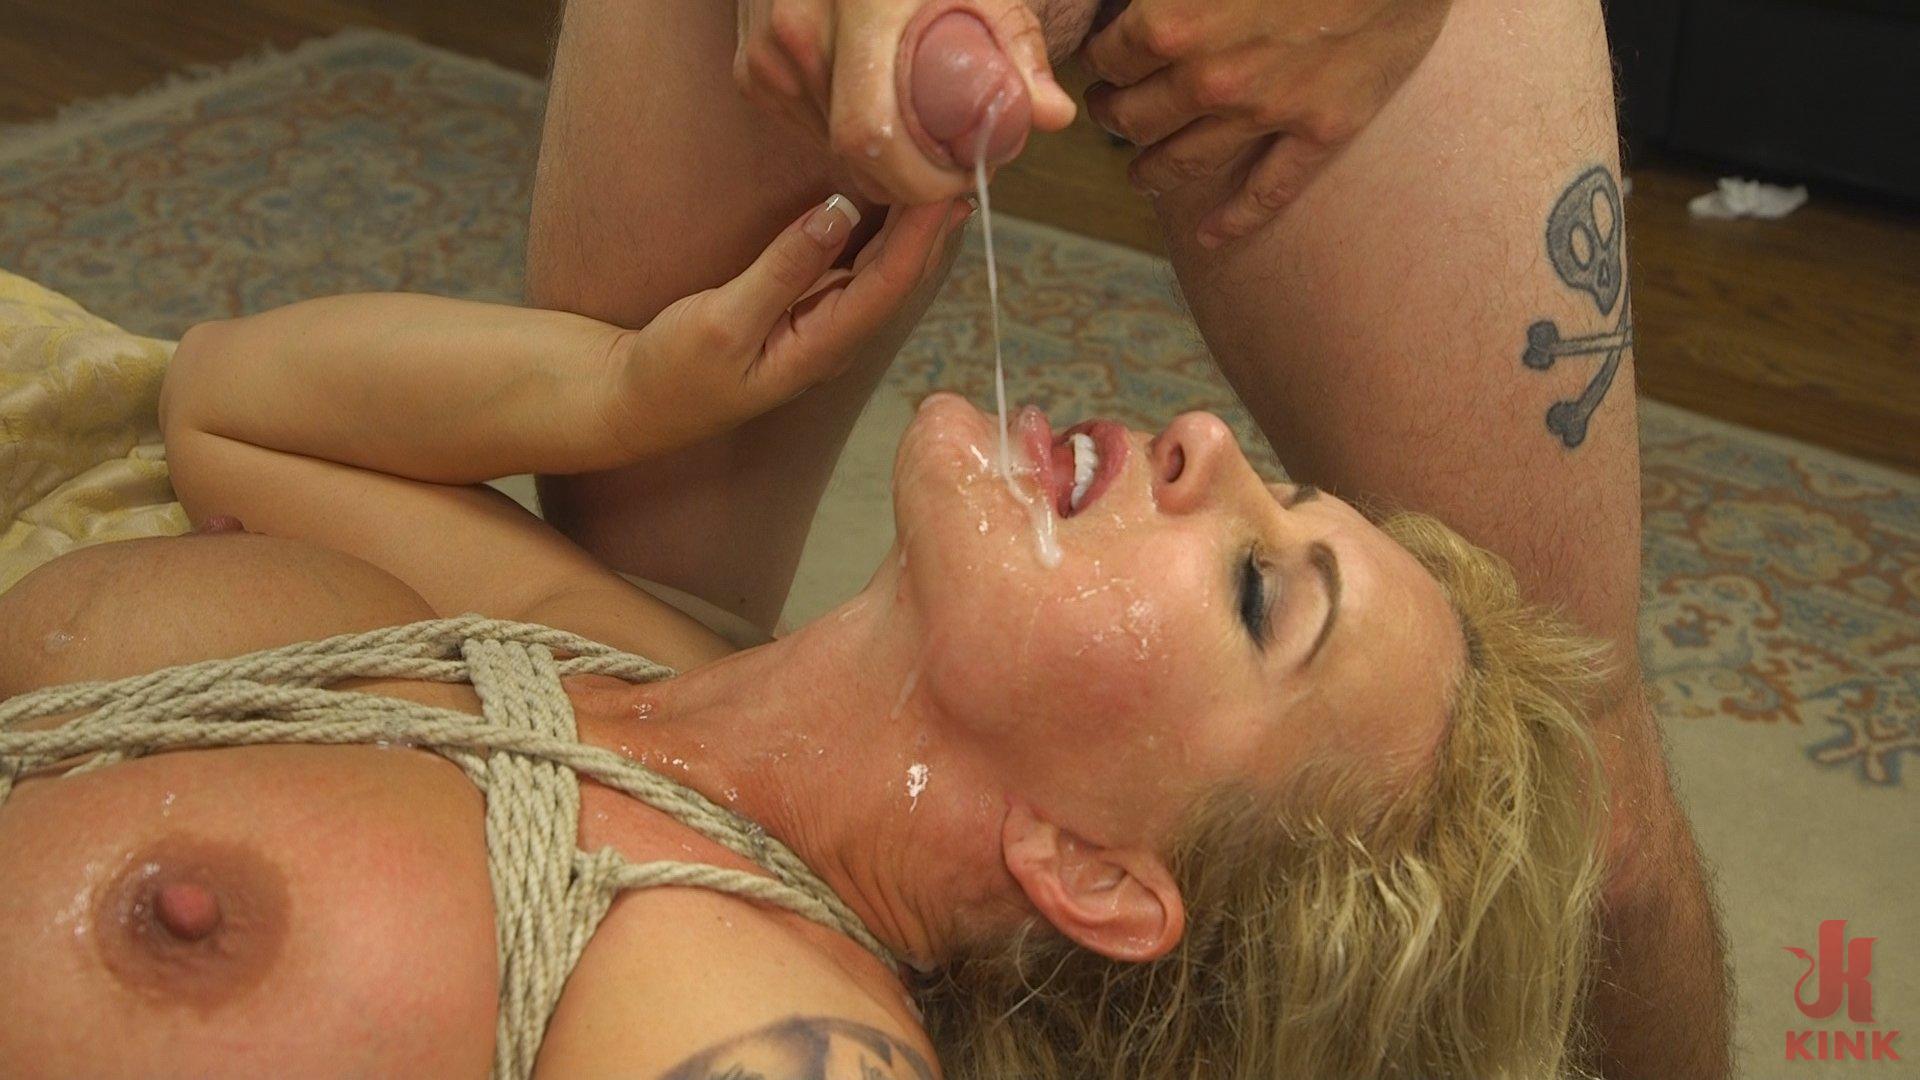 Wet Hot American Stepmom: MILF/COUGAR gangbanged by stepson & friends! -  Kink